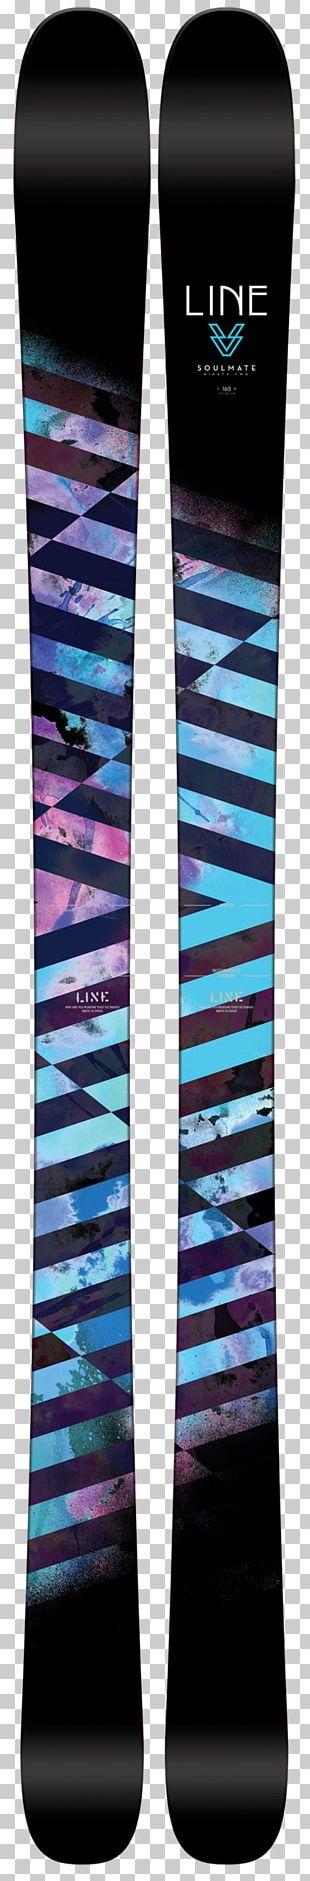 Line Skis Line Supernatural 92 2015/16 Freeskiing Freeriding PNG